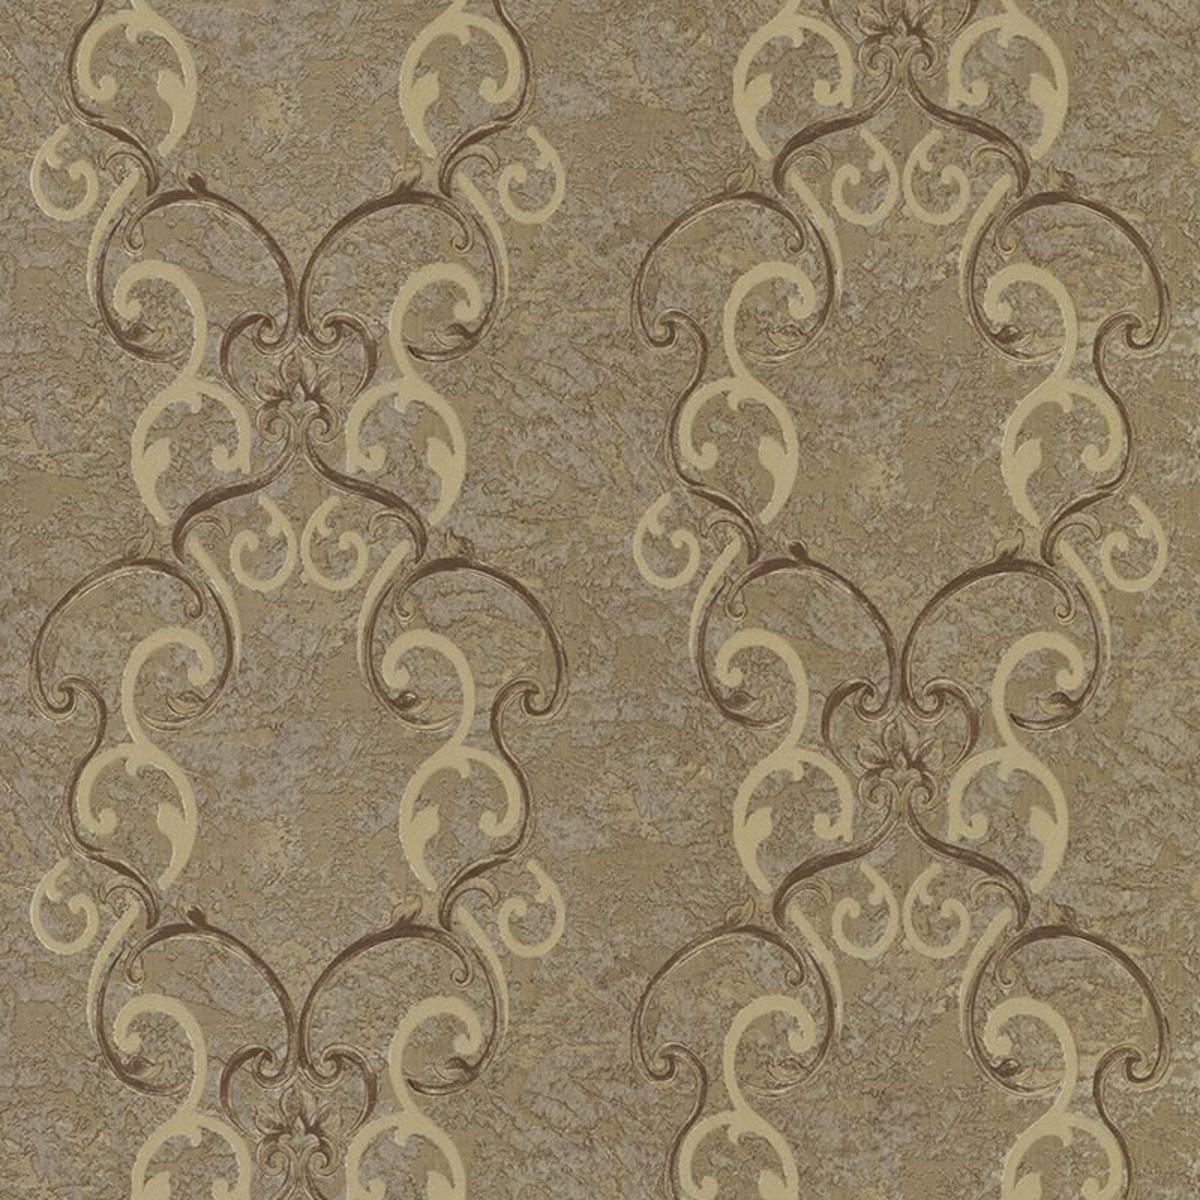 Обои флизелиновые Decori-Decori Altera коричневые 1.06 м 82359